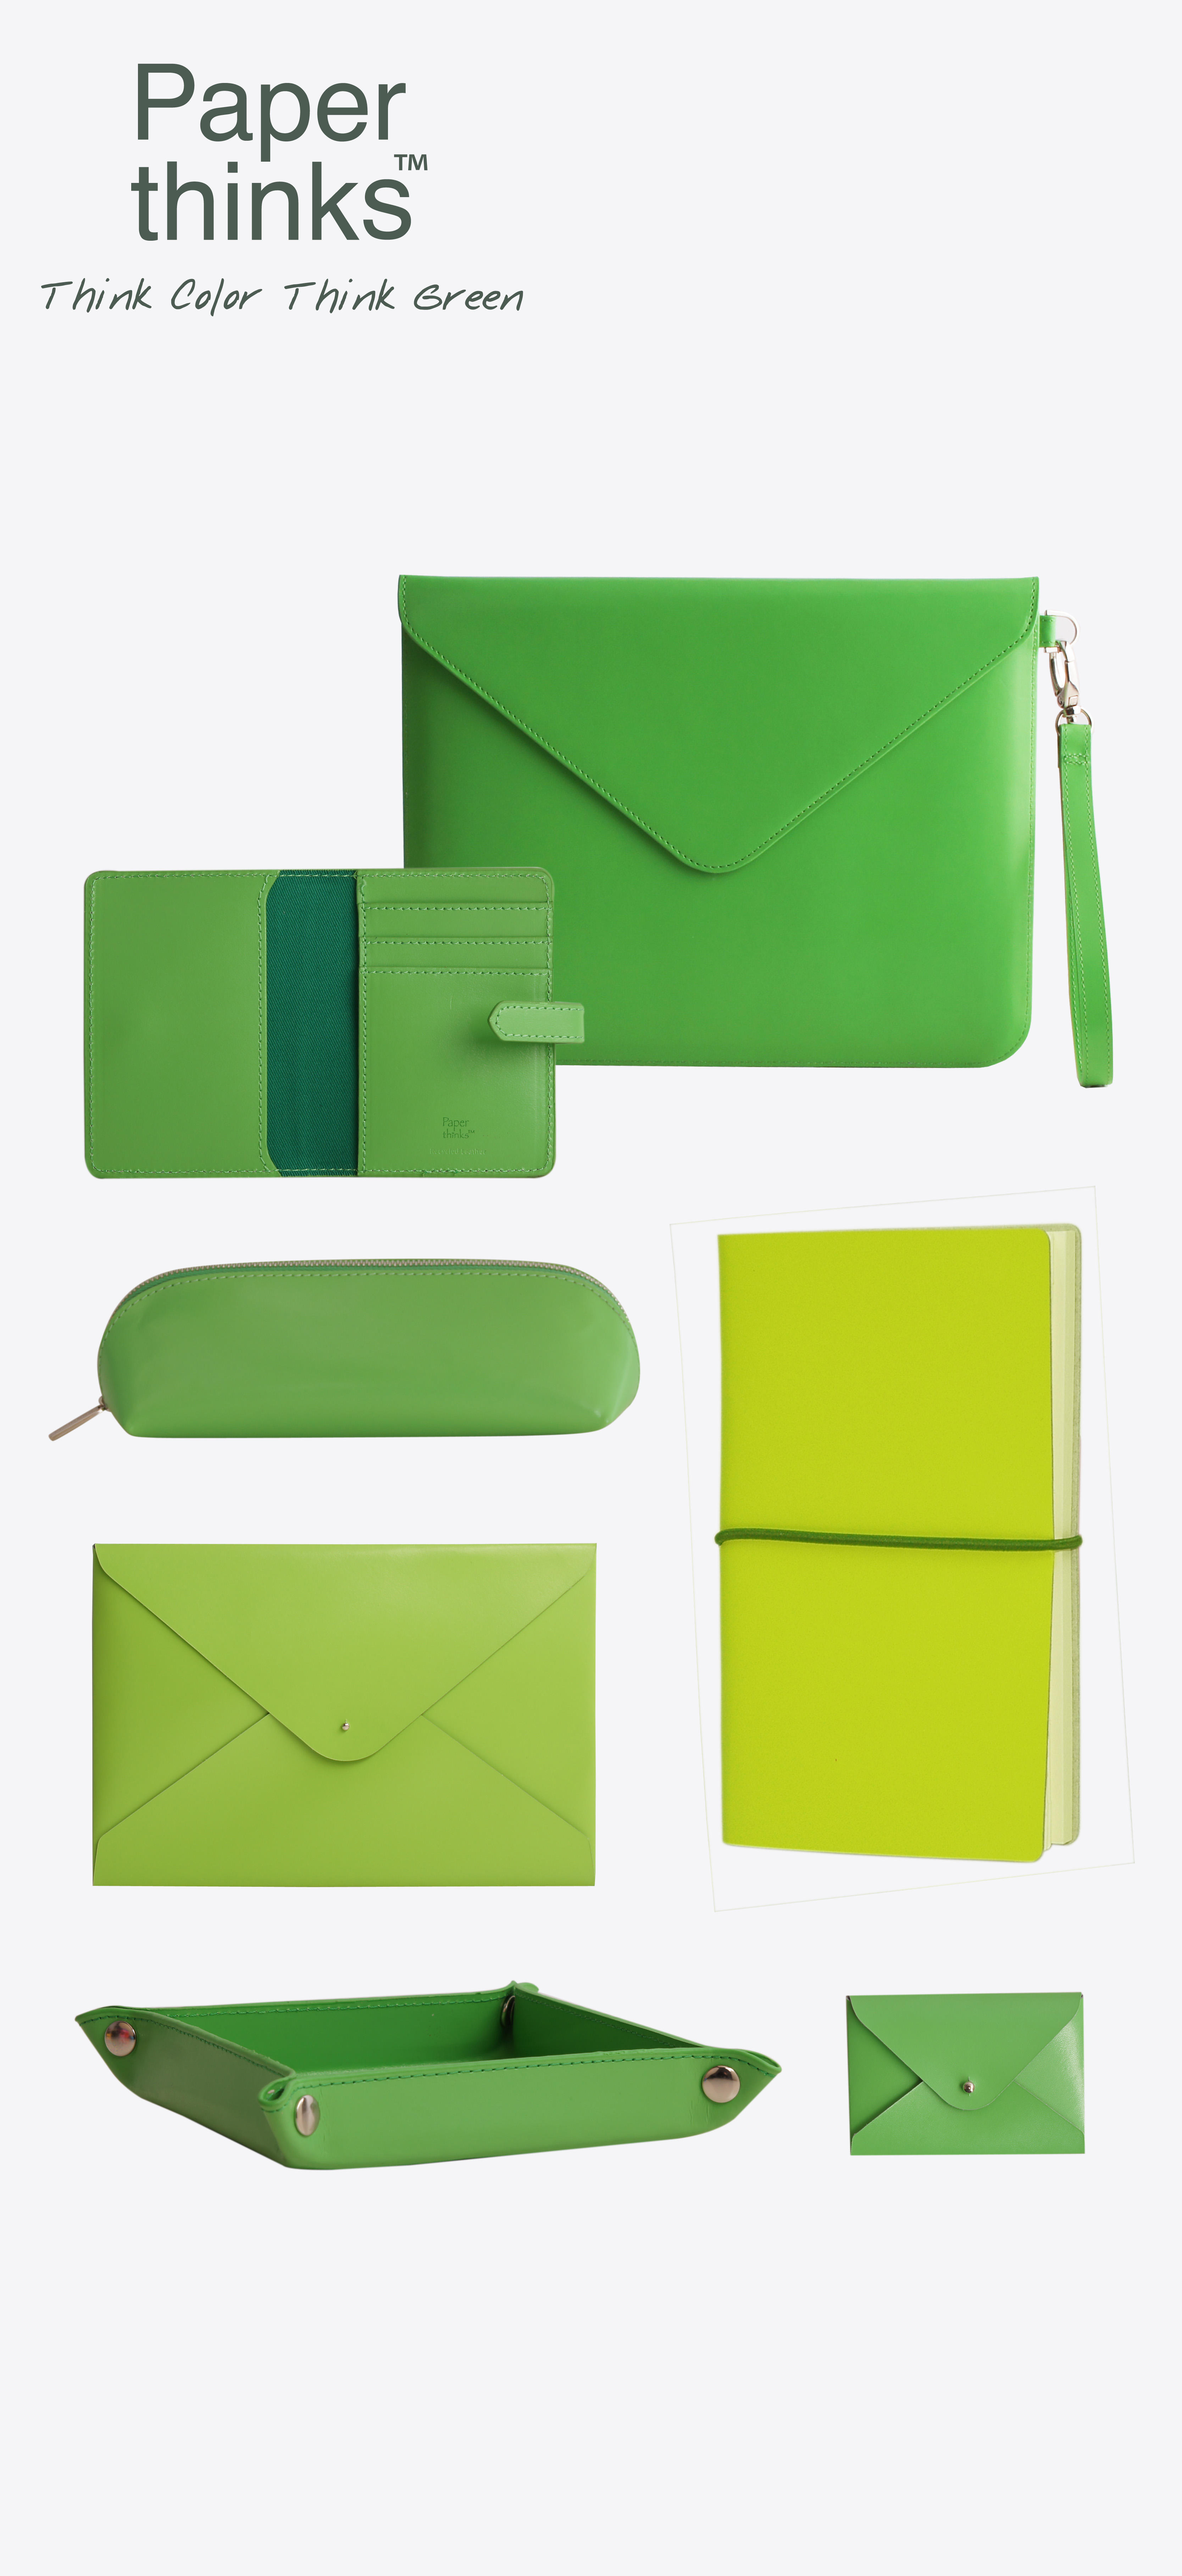 Kolorowe produkty Paperthinks